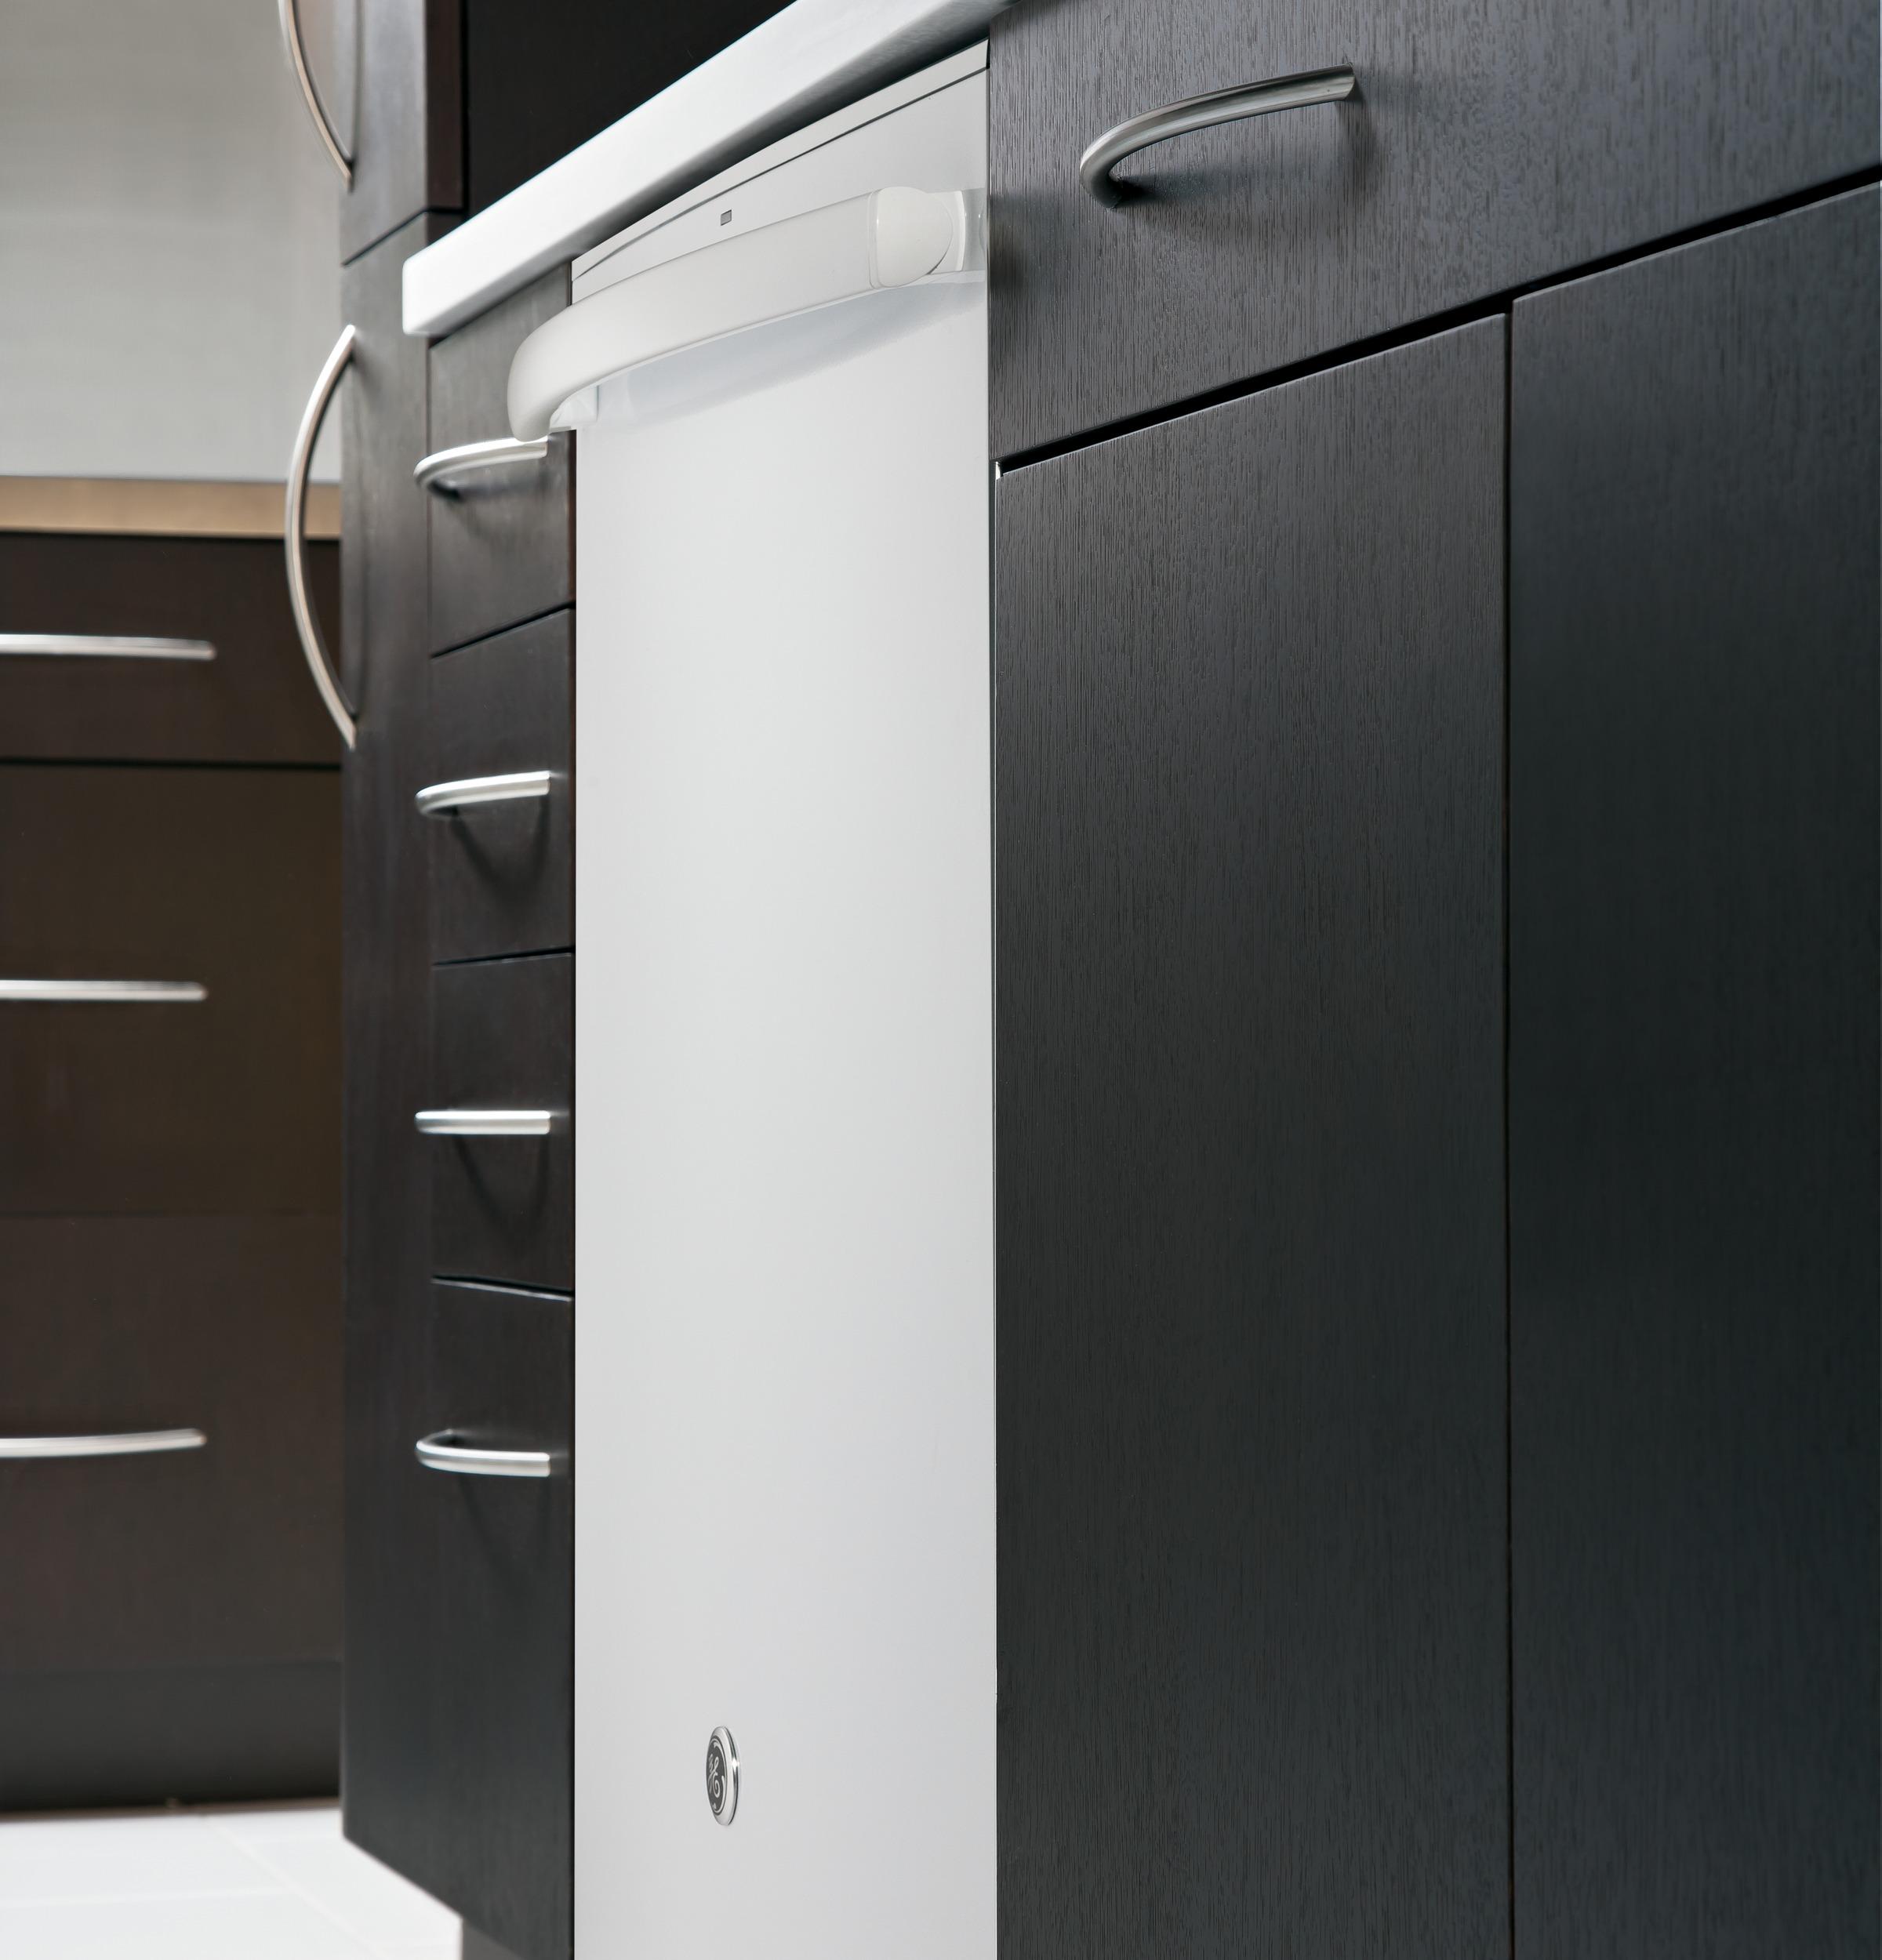 Model: GDT695SGJWW | GE® Stainless Steel Interior Dishwasher with Hidden Controls